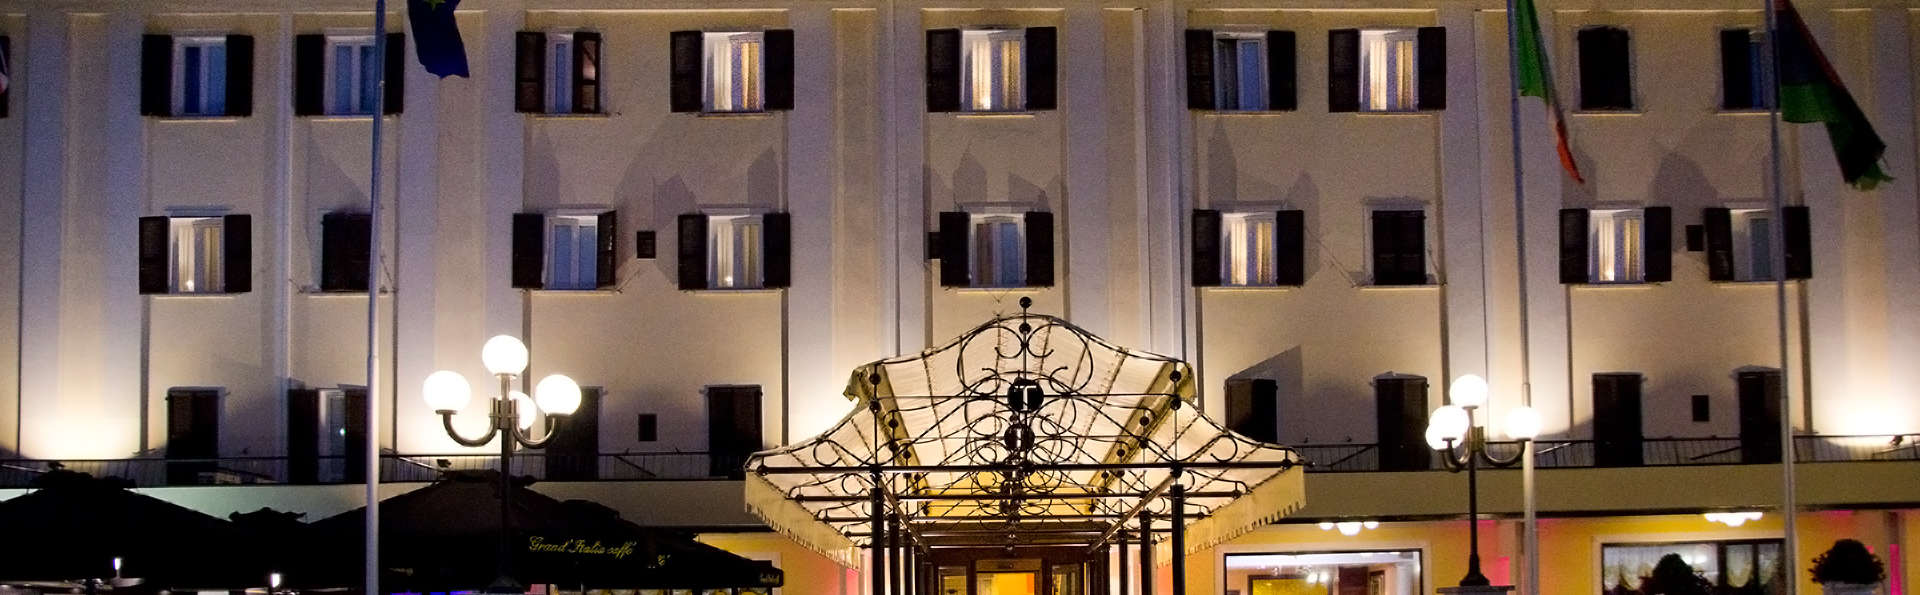 Le Fonti Grand Hotel - Edit_Front.jpg